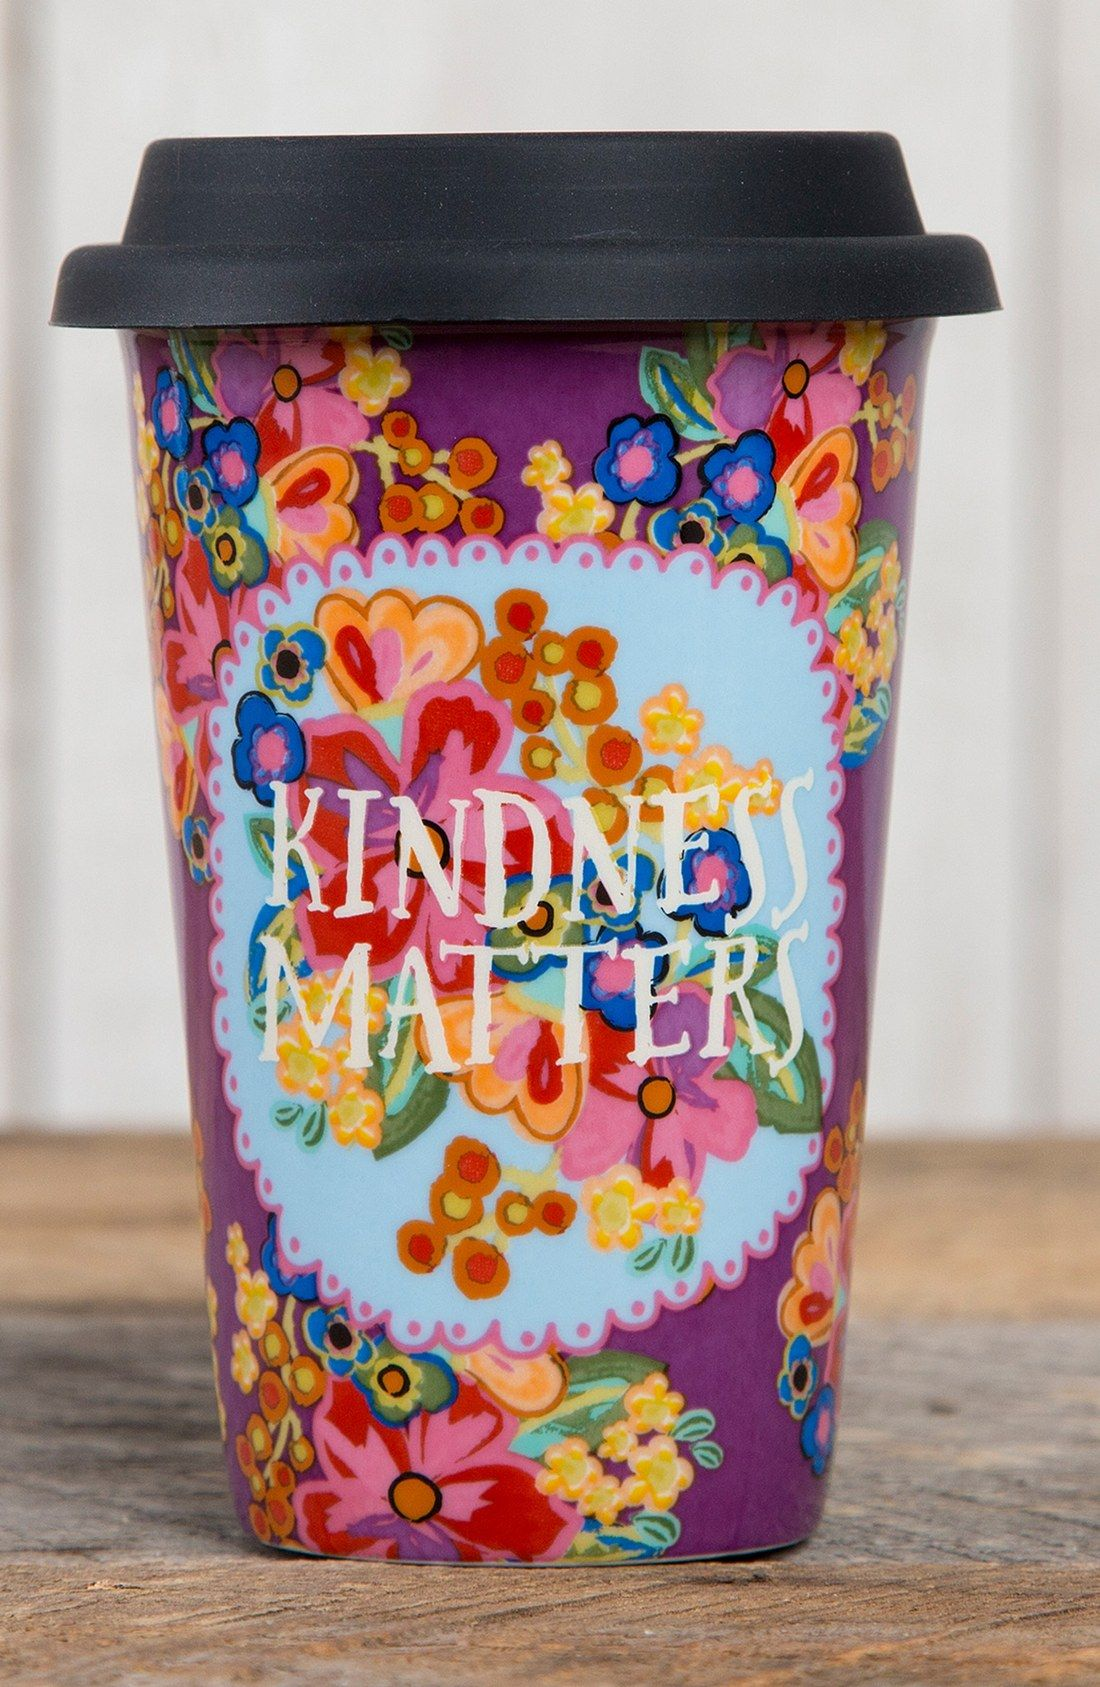 Natural Life Kindness Matters Ceramic Thermal Mug Nordstrom Thermal Mug Mugs Cool Mugs